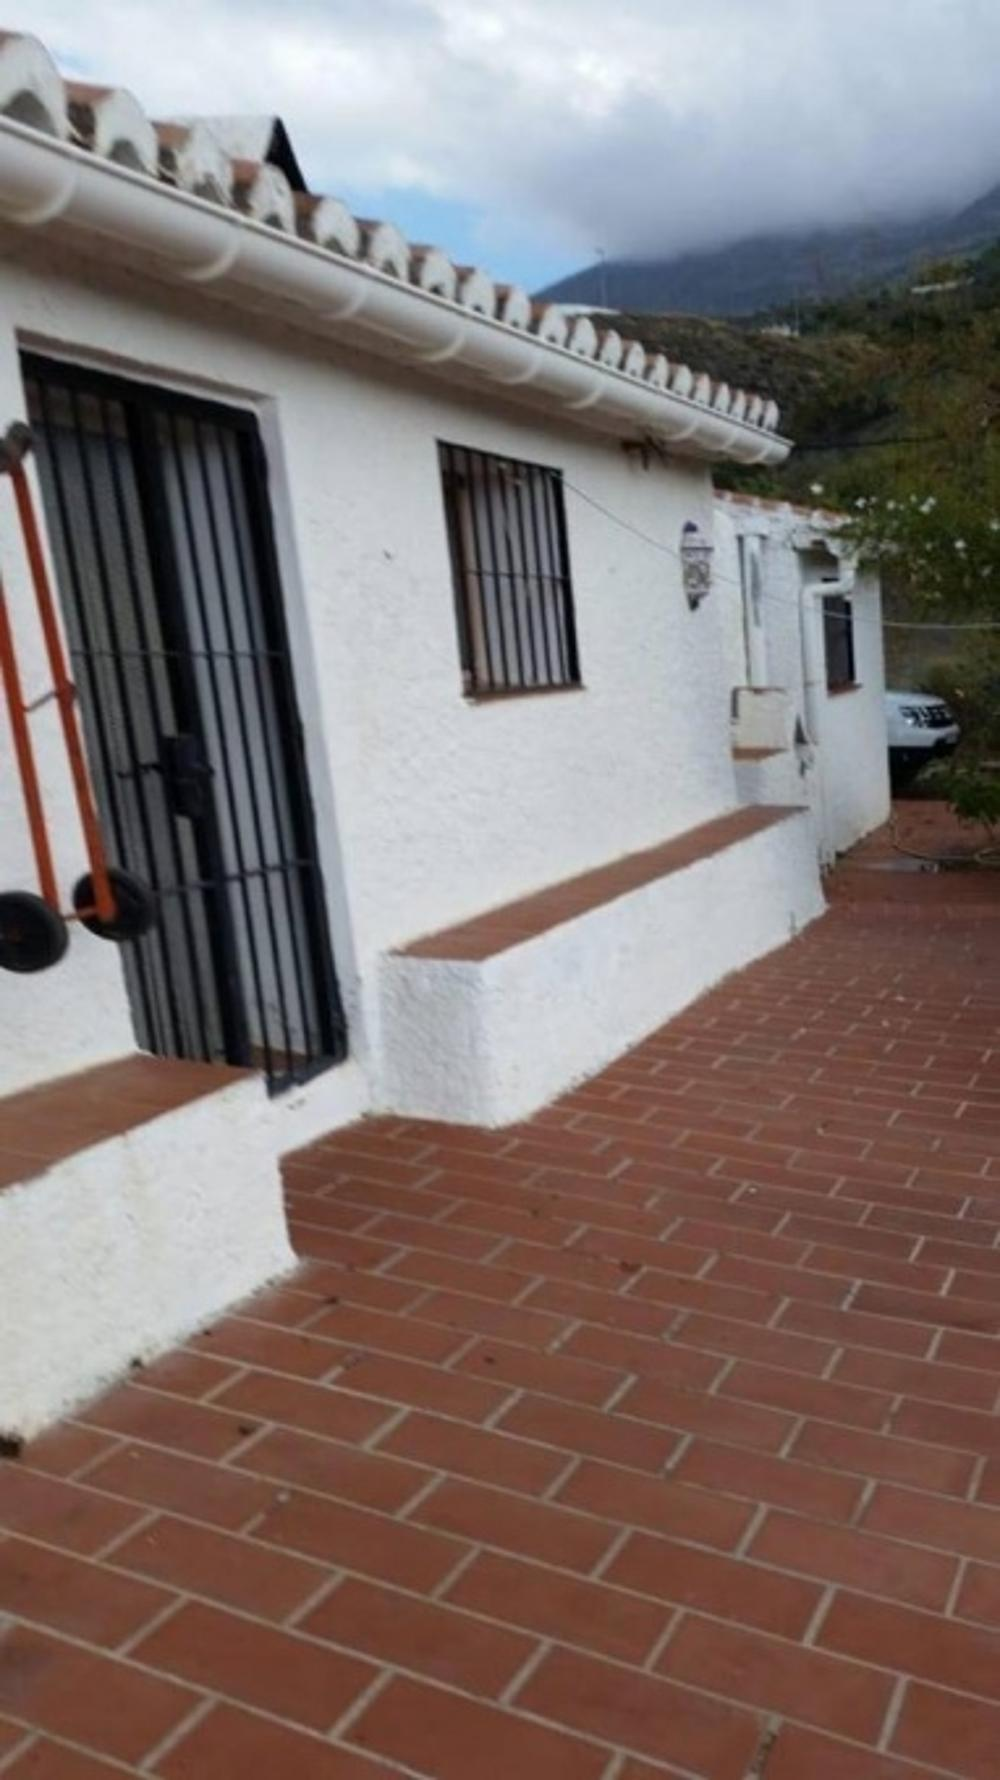 canillas de aceituno málaga hus på landet foto 3699069